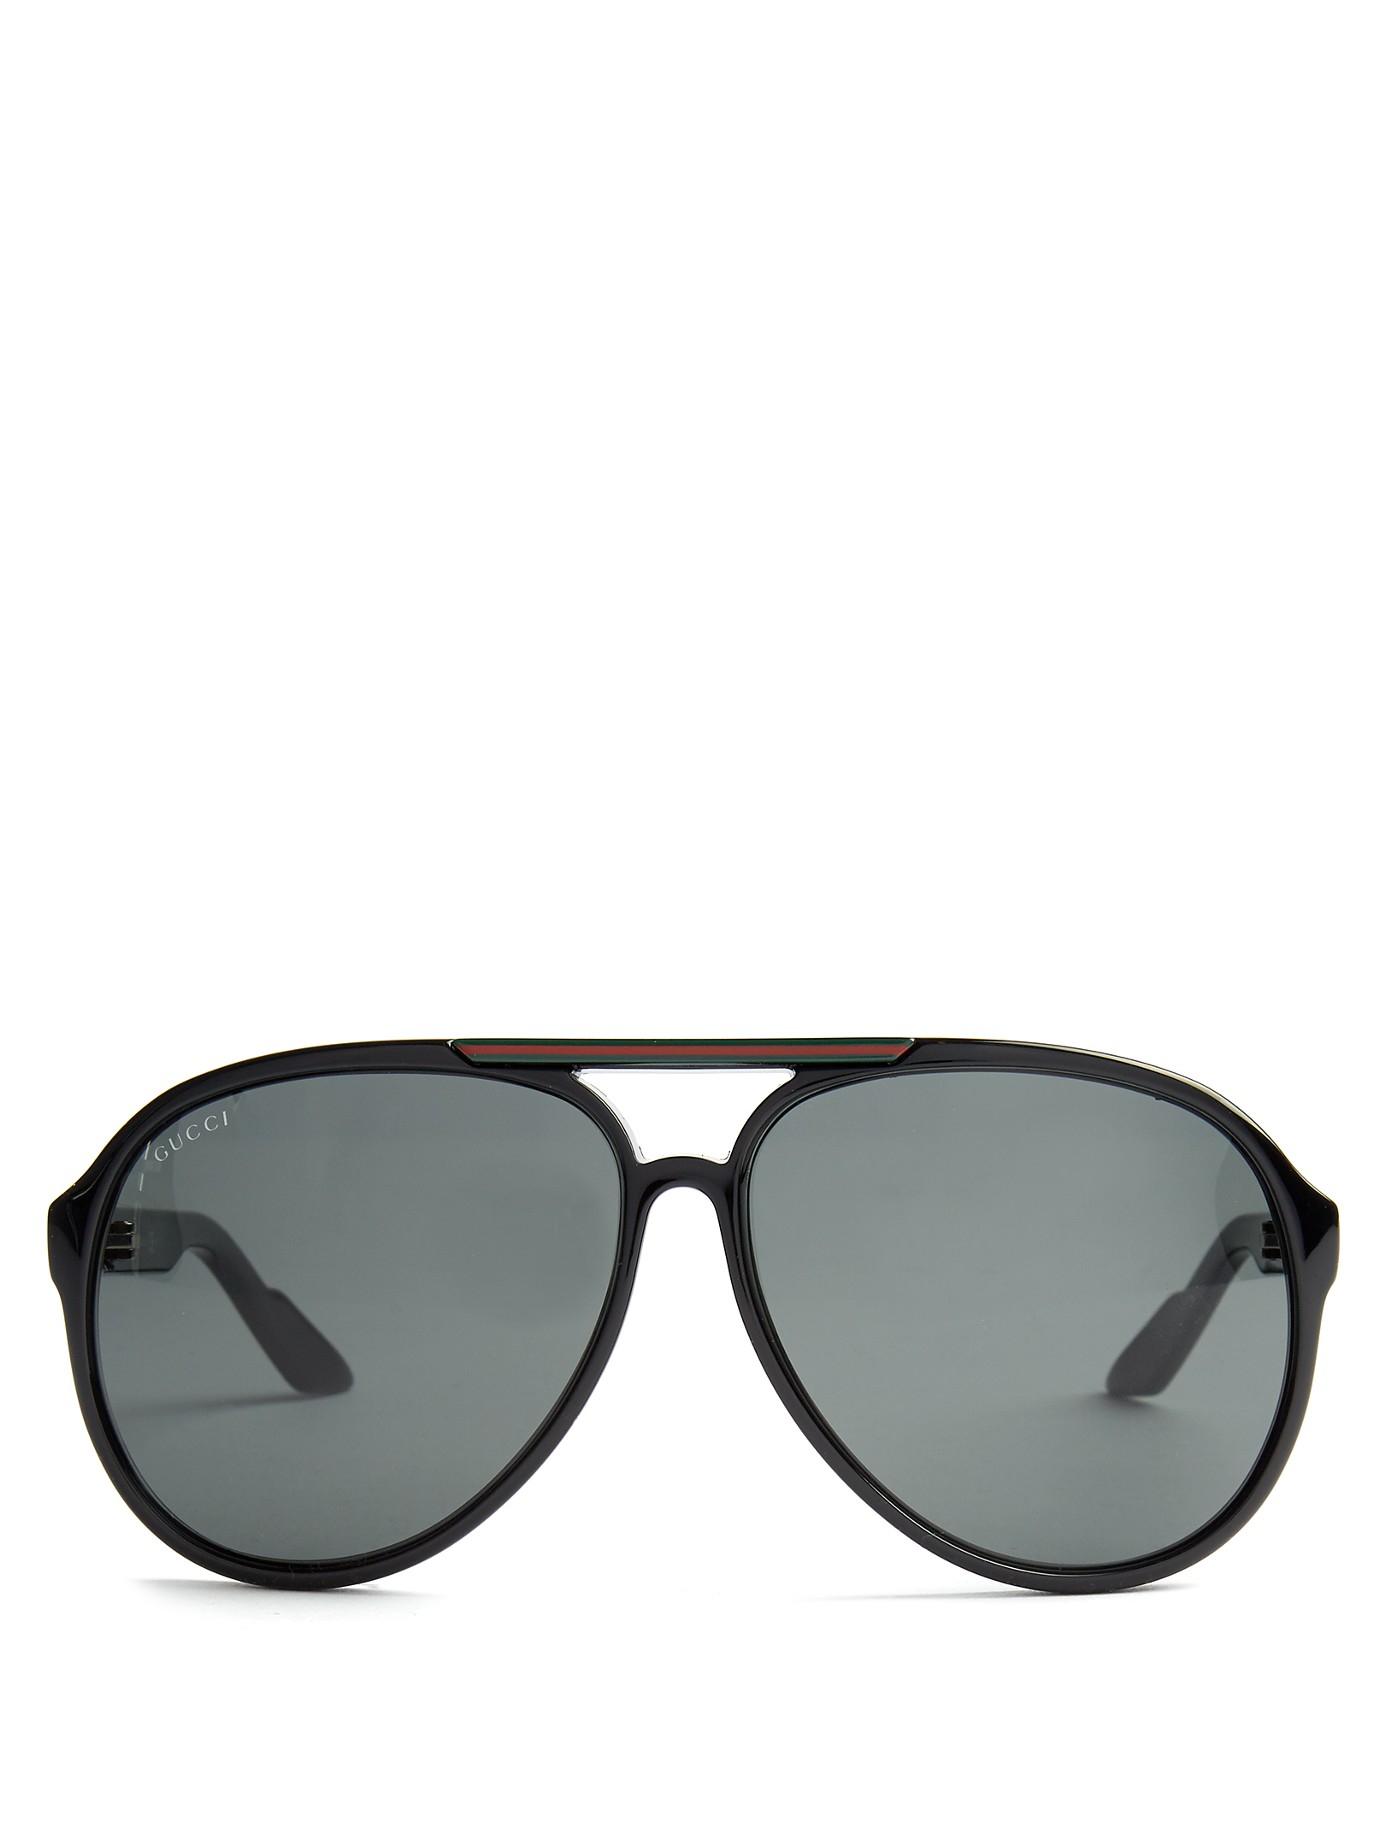 ff46a20c406 Ray Bans Sunglasses Macys « Heritage Malta